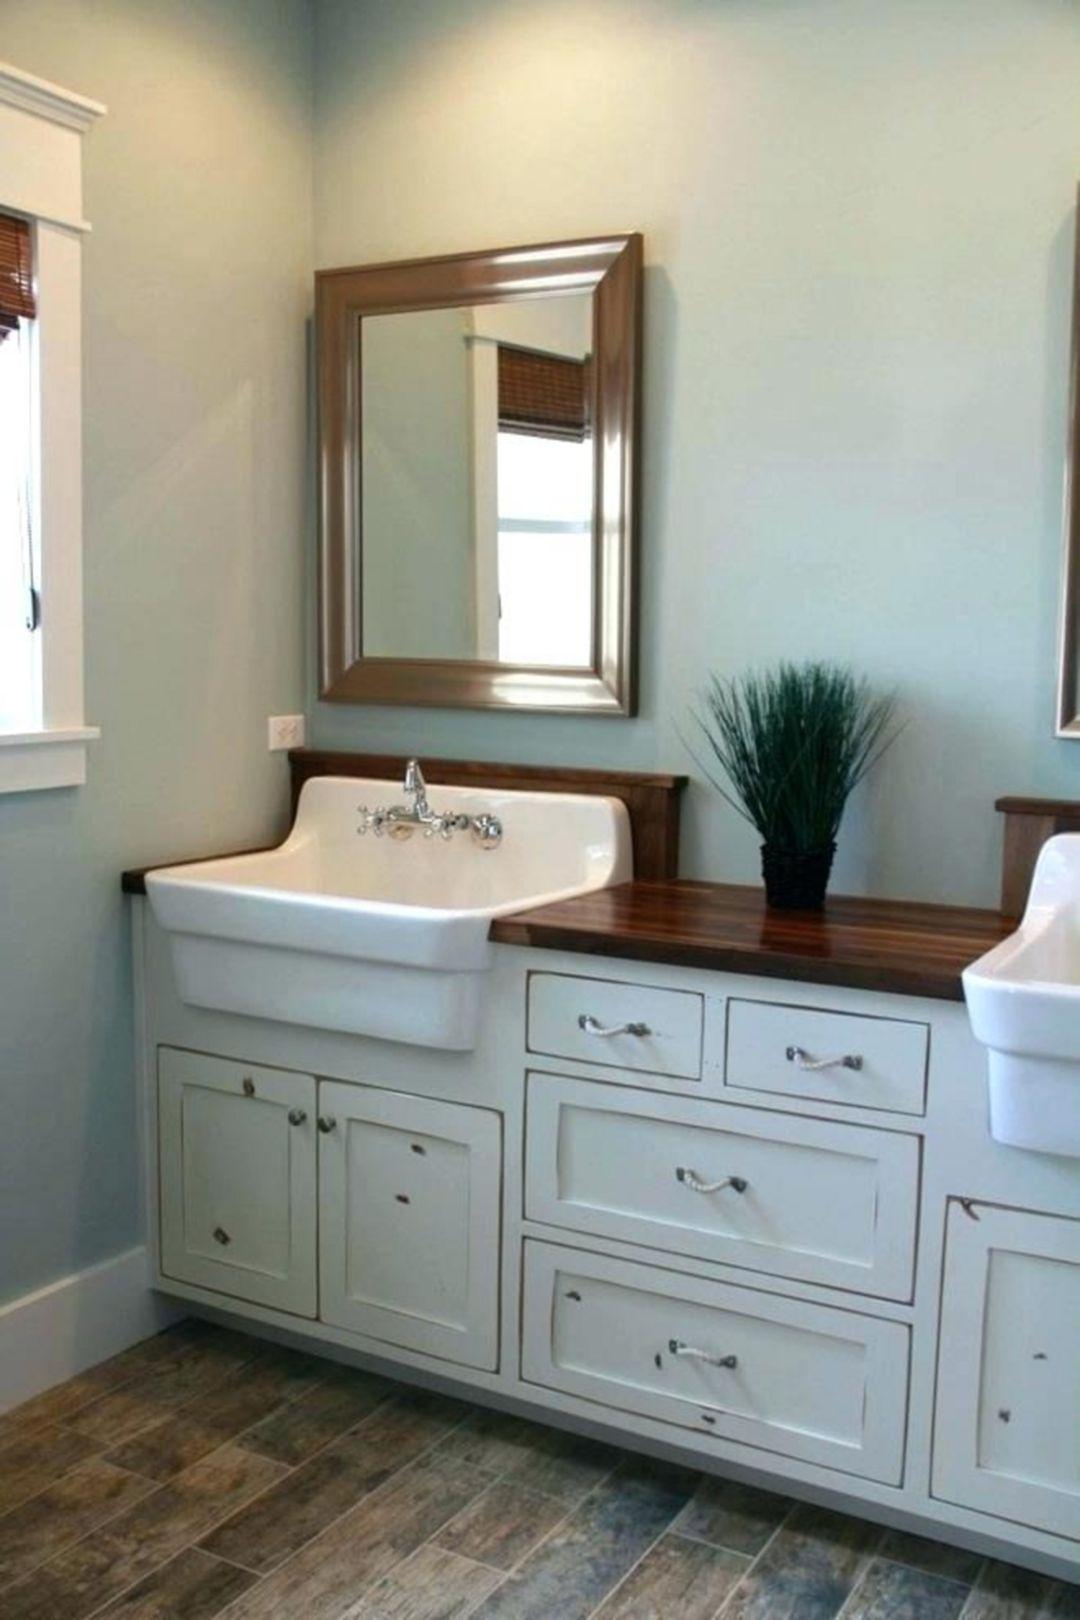 15 Wonderful Farmhouse Bathroom Design And Decor Ideas You Have